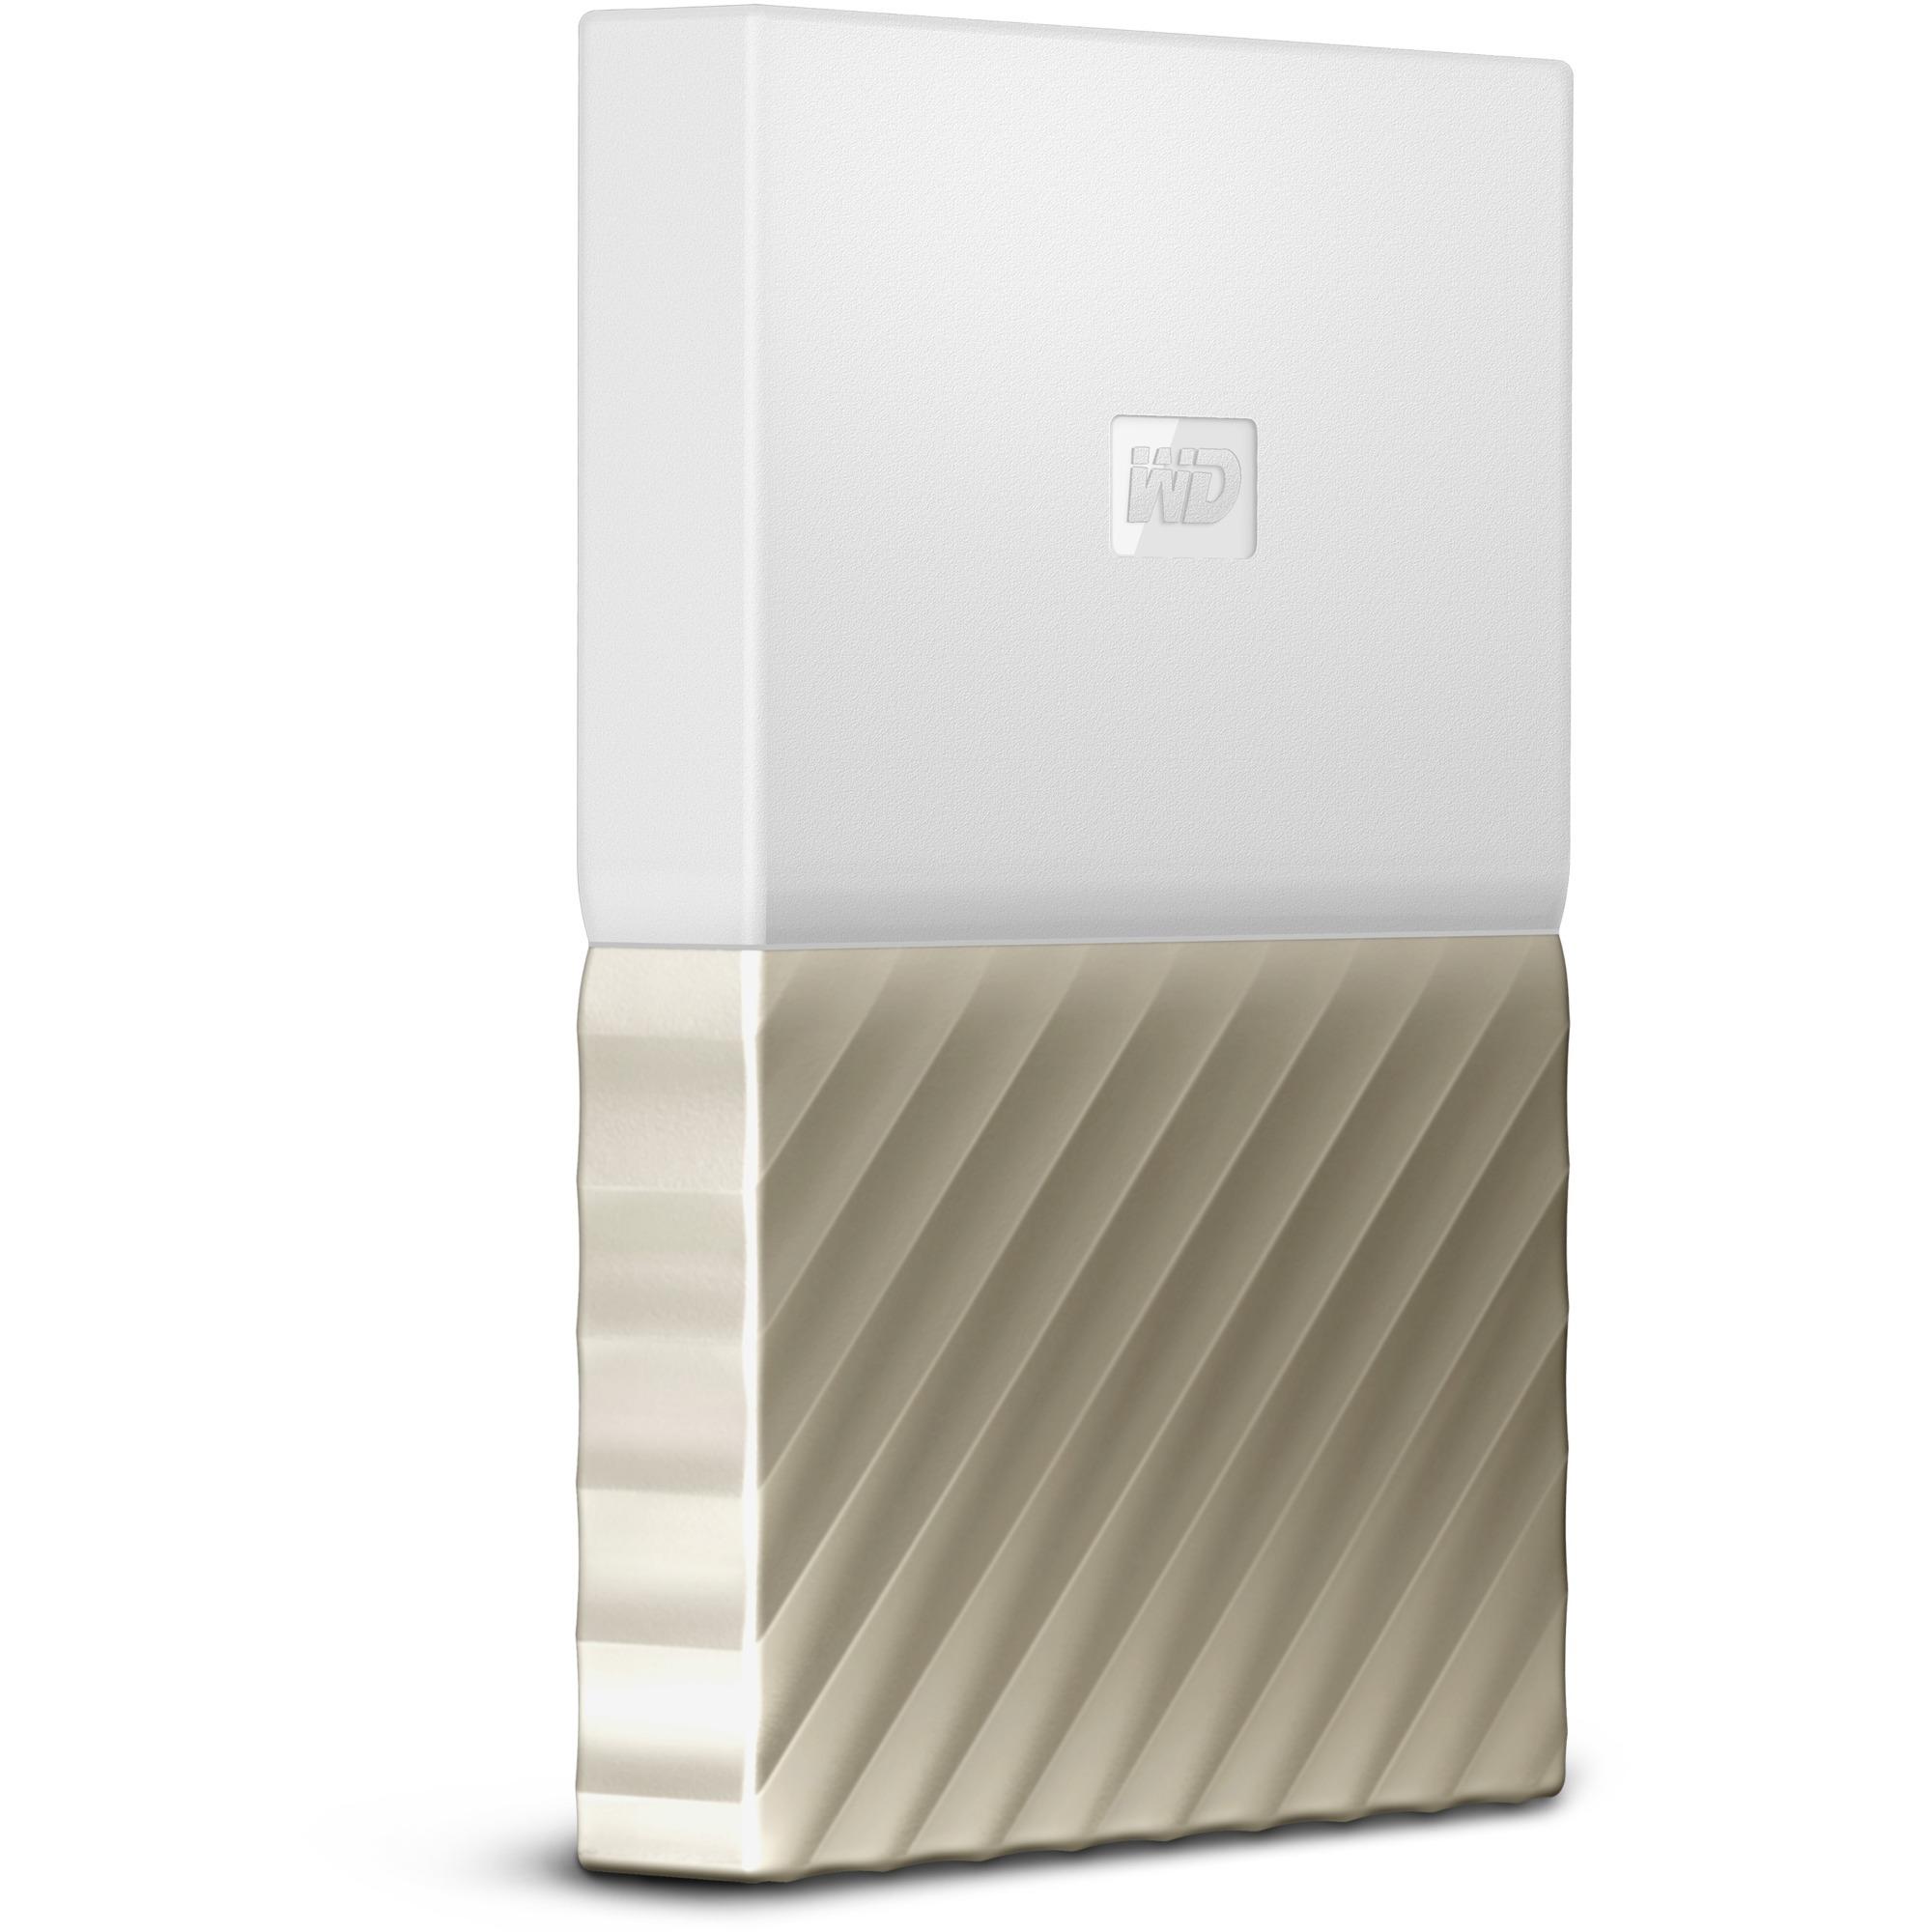 My Passport Ultra 1000Go Or, Blanc disque dur externe